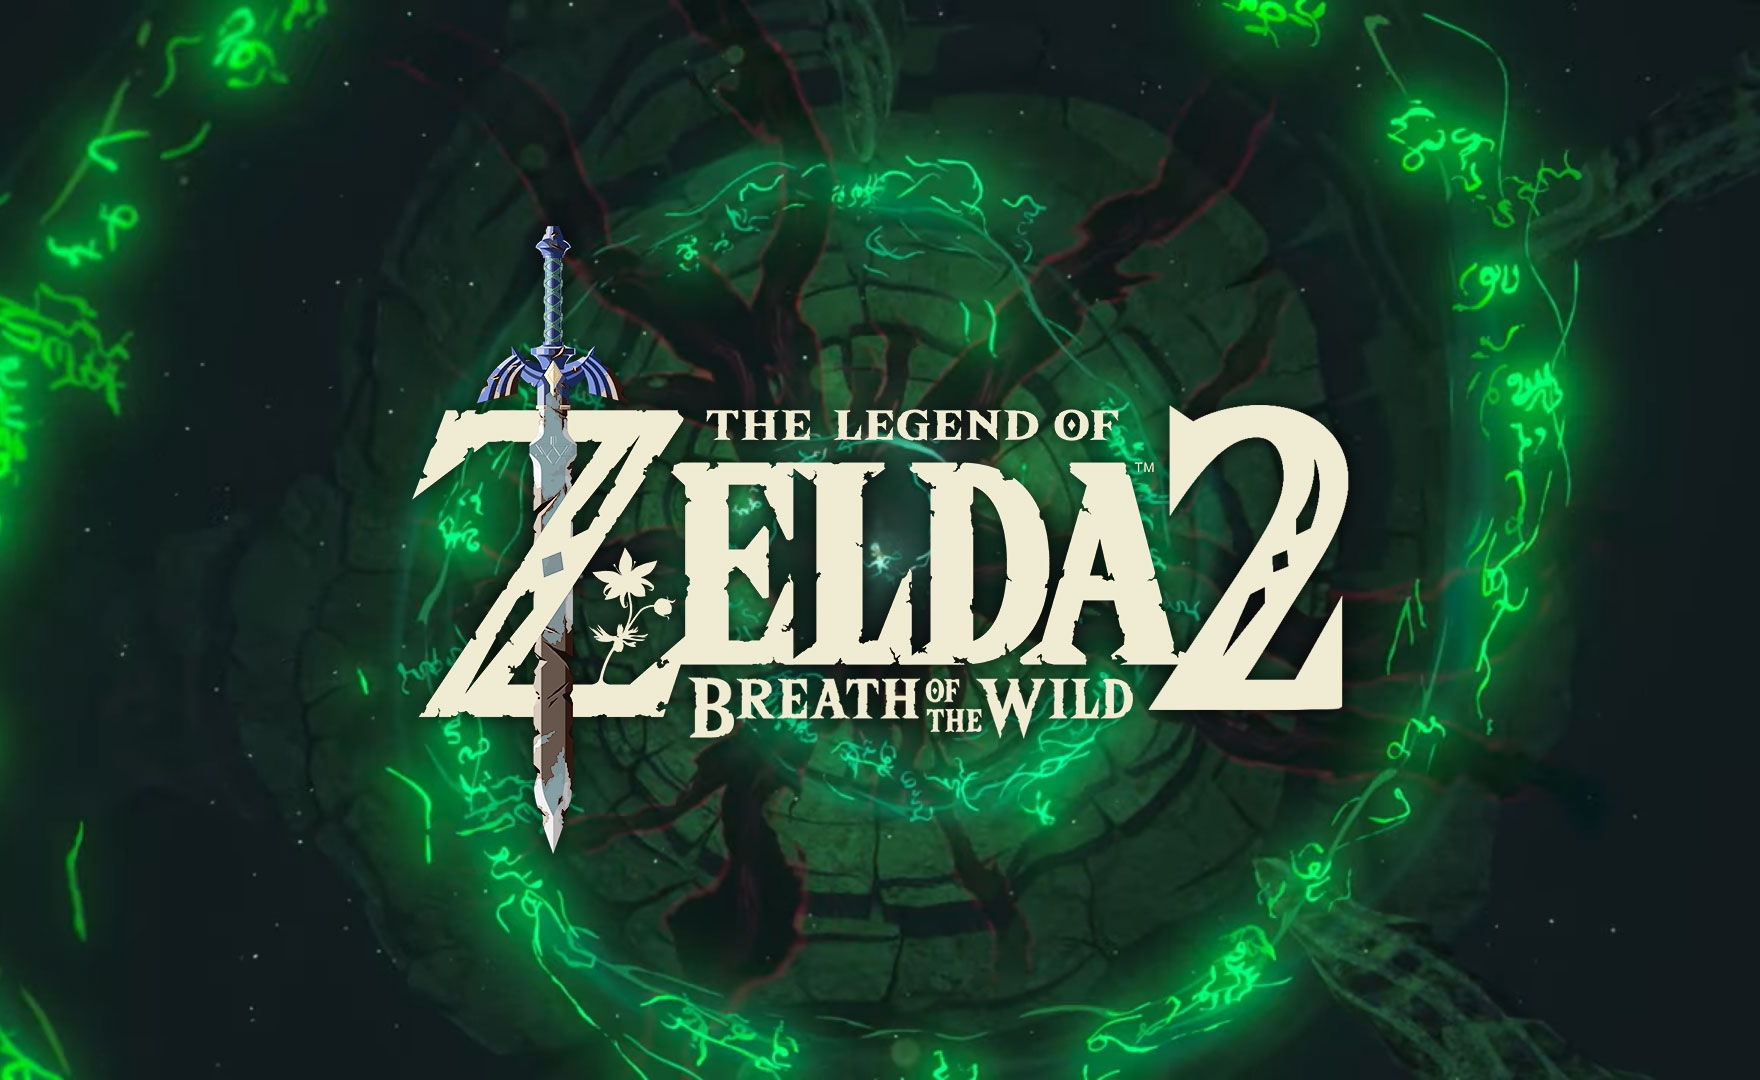 Zelda Breath of the Wild 2 arriva su Game Boy?